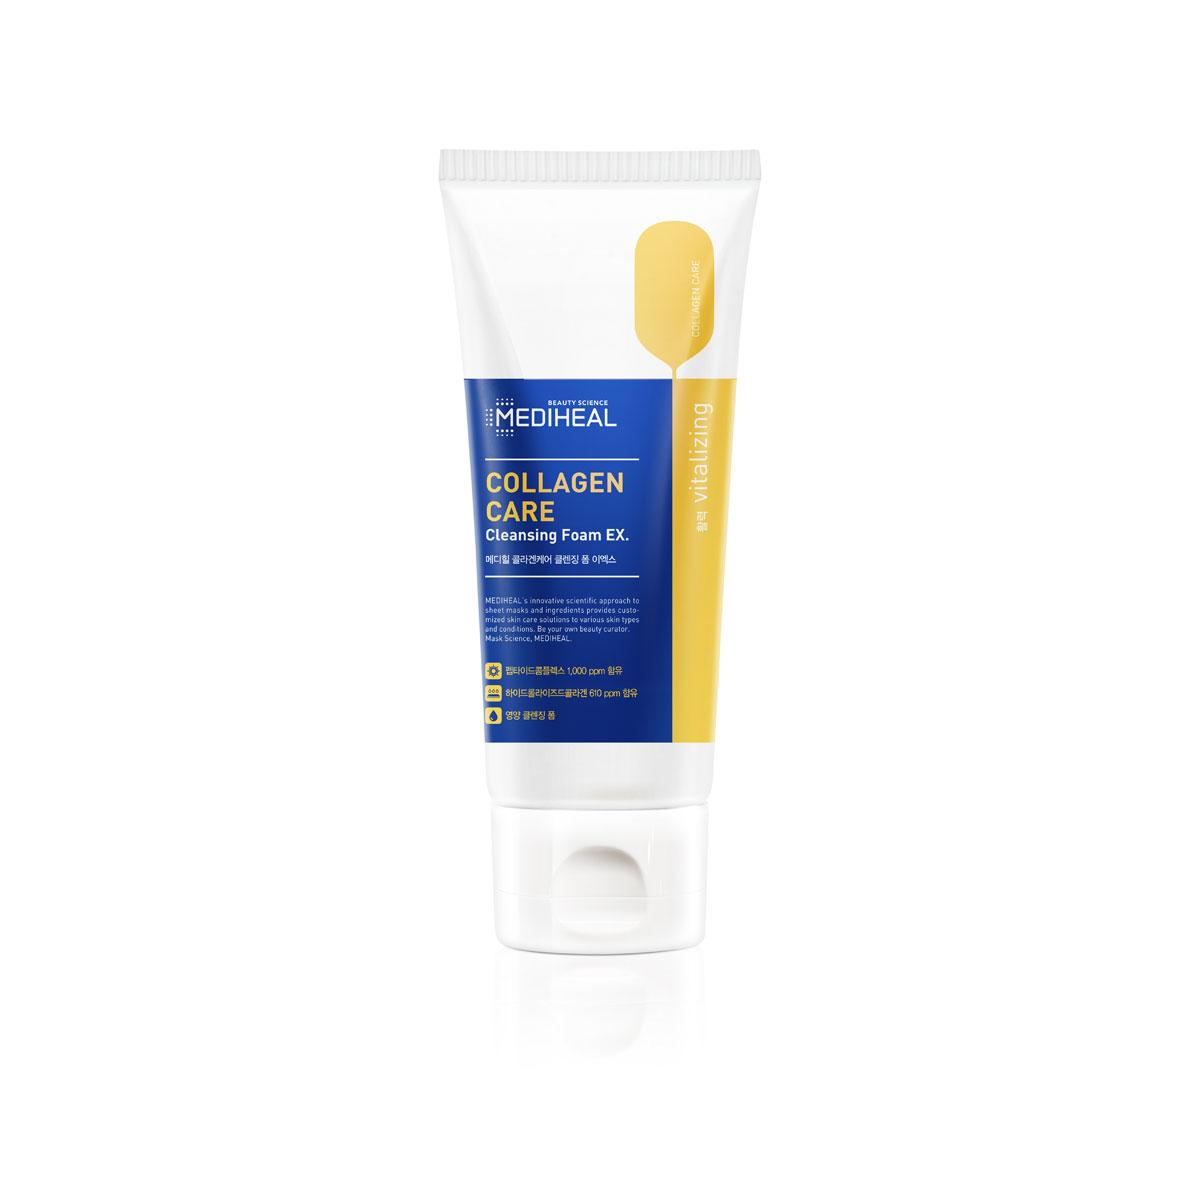 Mediheal Collagen Care Cleansing Foam 170 ml